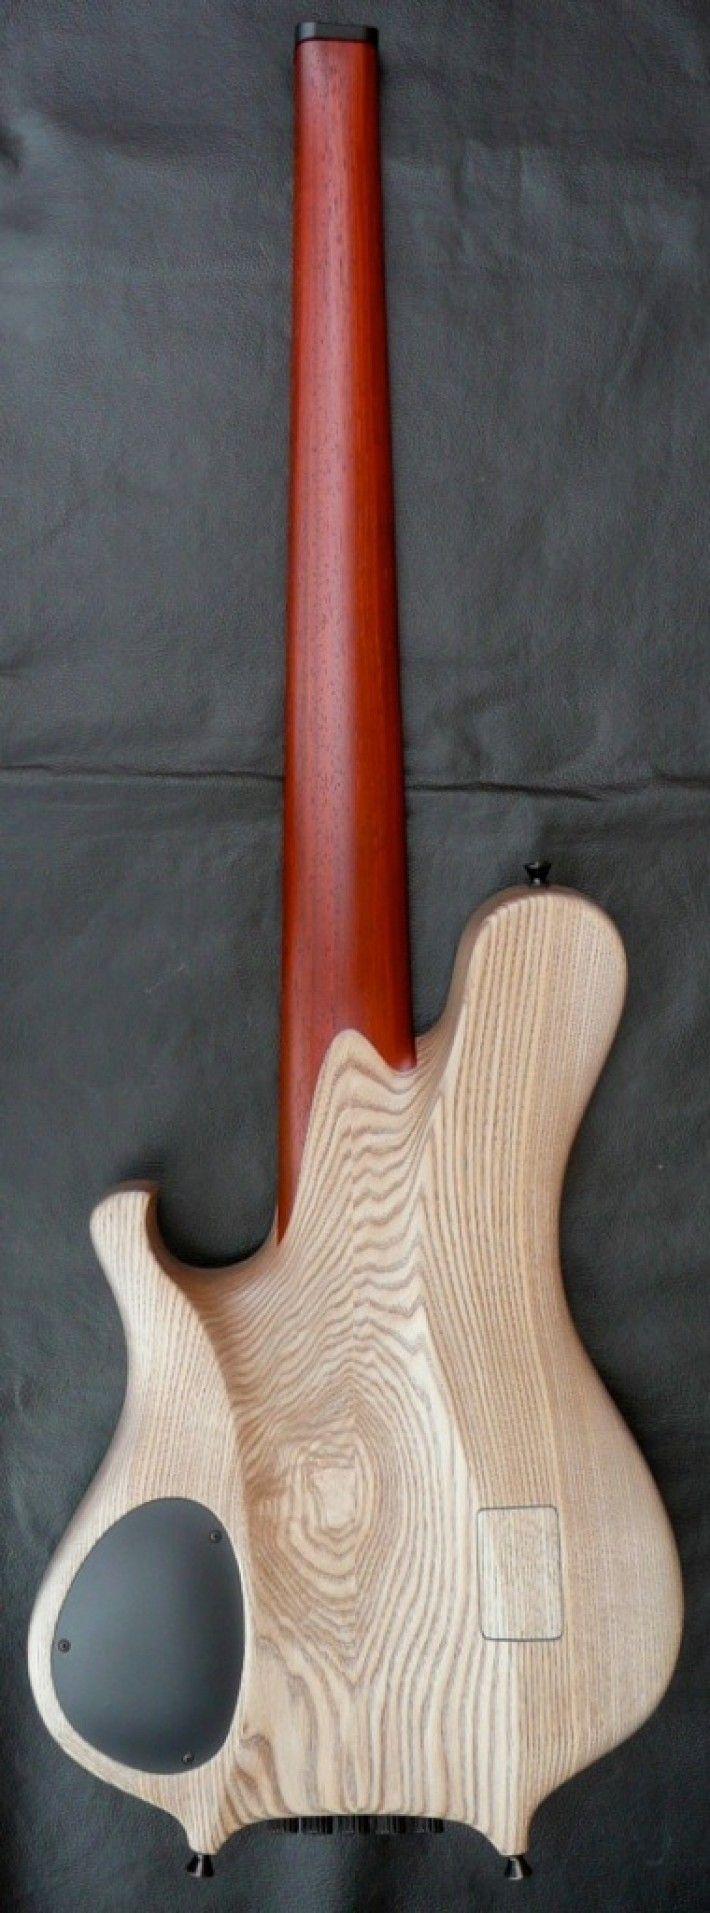 Le Fay Pangton Fan Fret 5-string headless bass